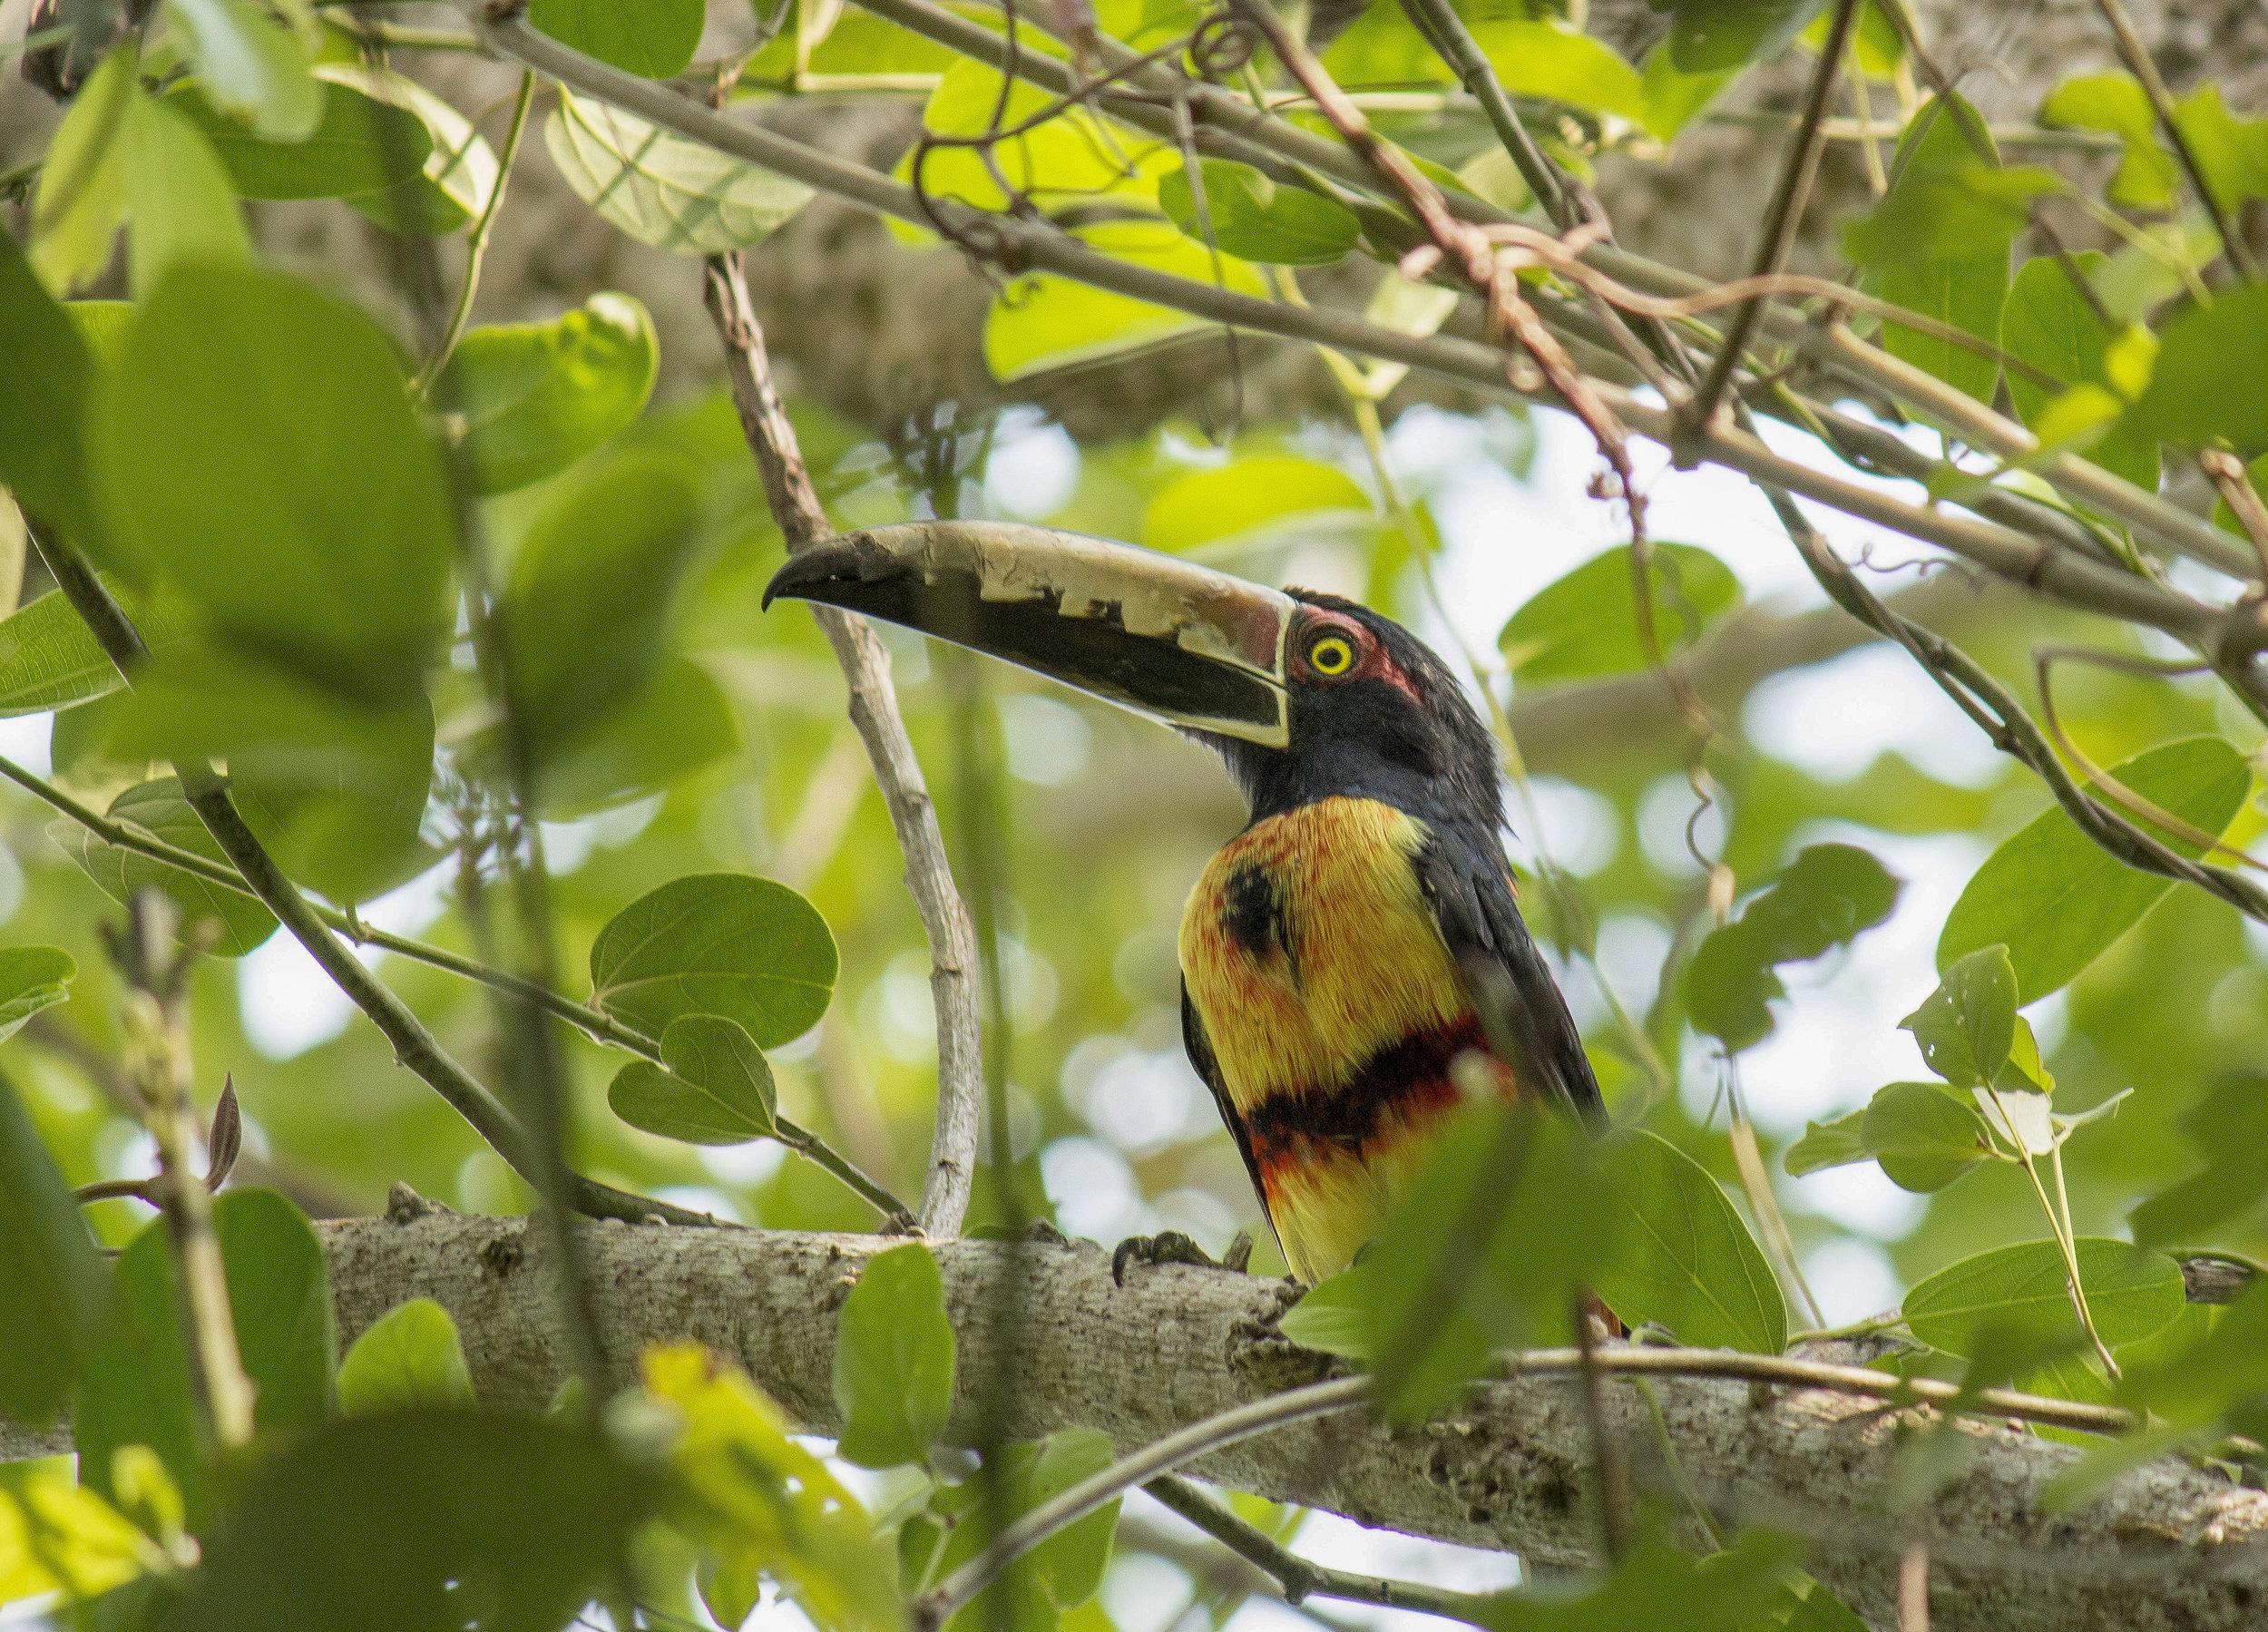 Collared-Aracari-Toucan-Bird-Minca-Sierra-Nevada-de-Santa-Marta-Colombia-Birding-Colombian-Project.jpg